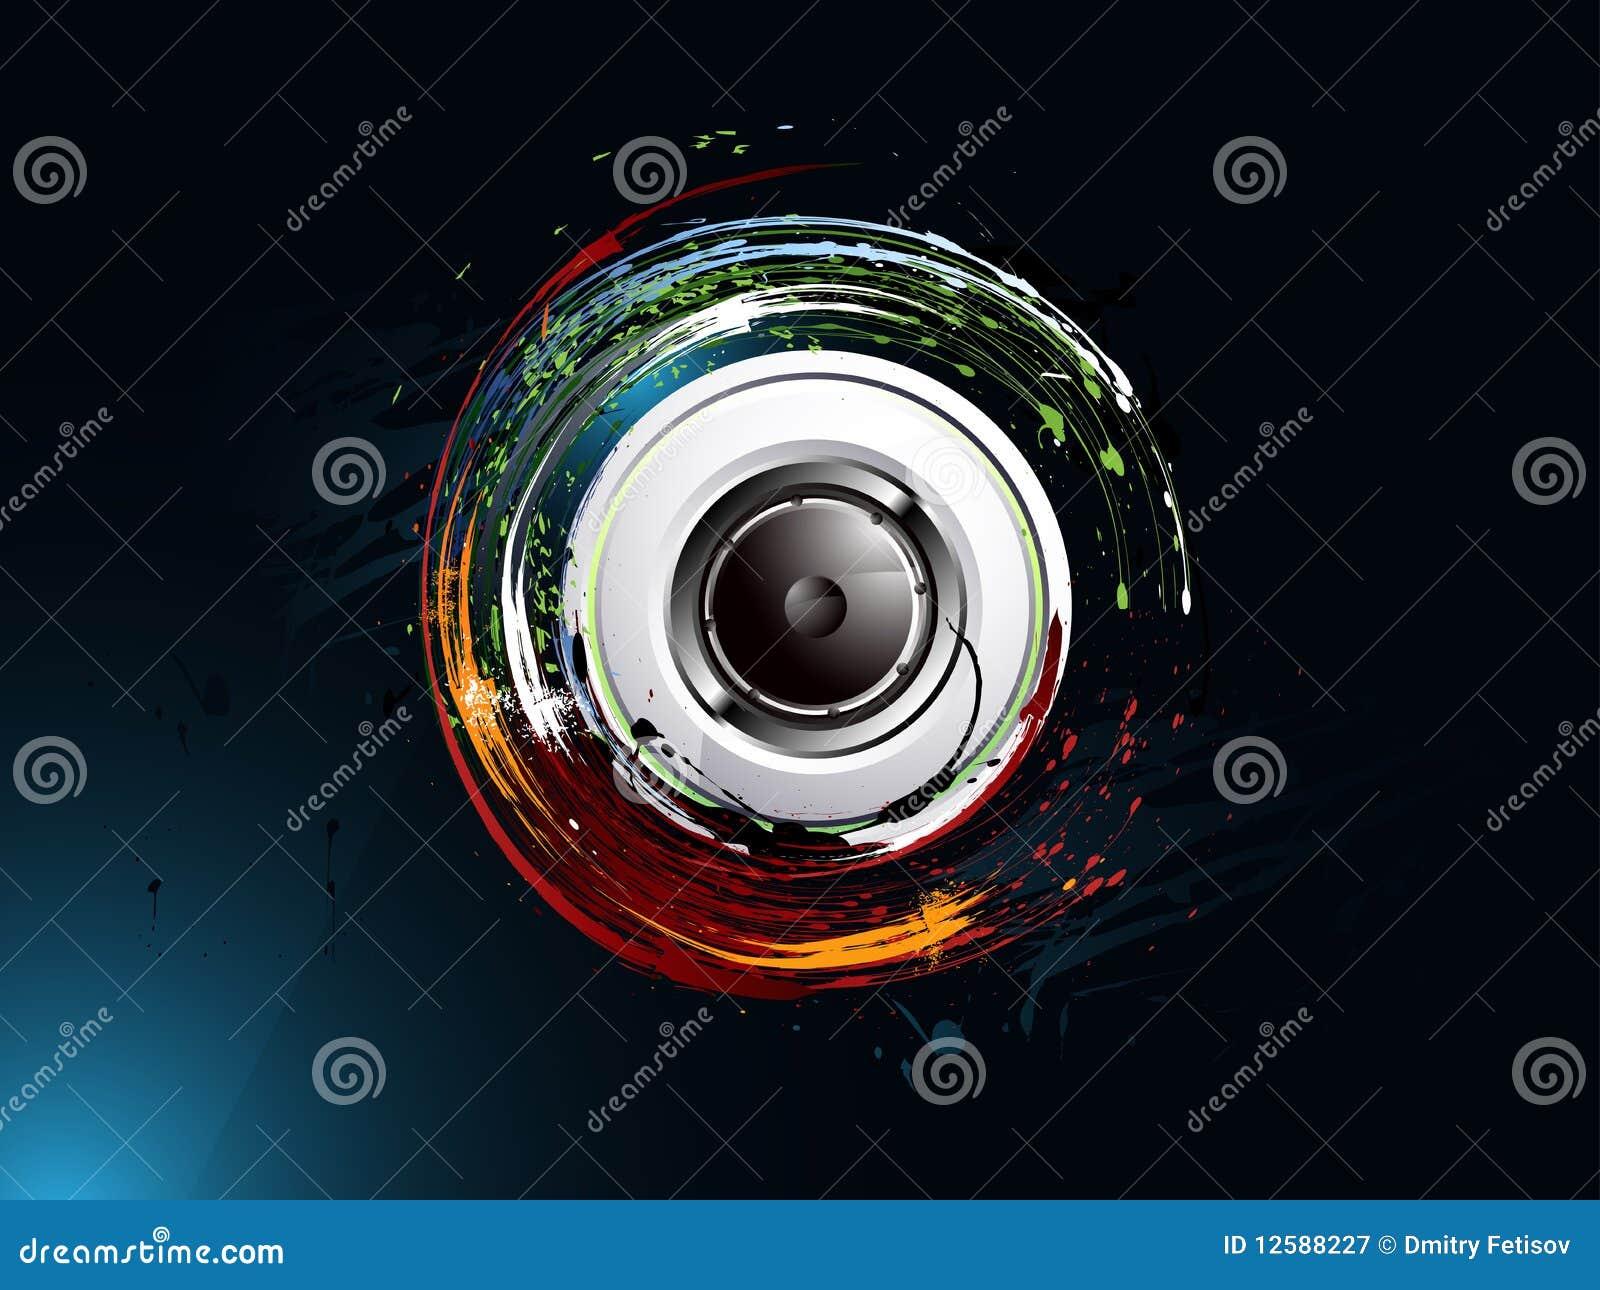 Grunge Camera Vector : Abstract grunge background loudspeaker stock vector illustration